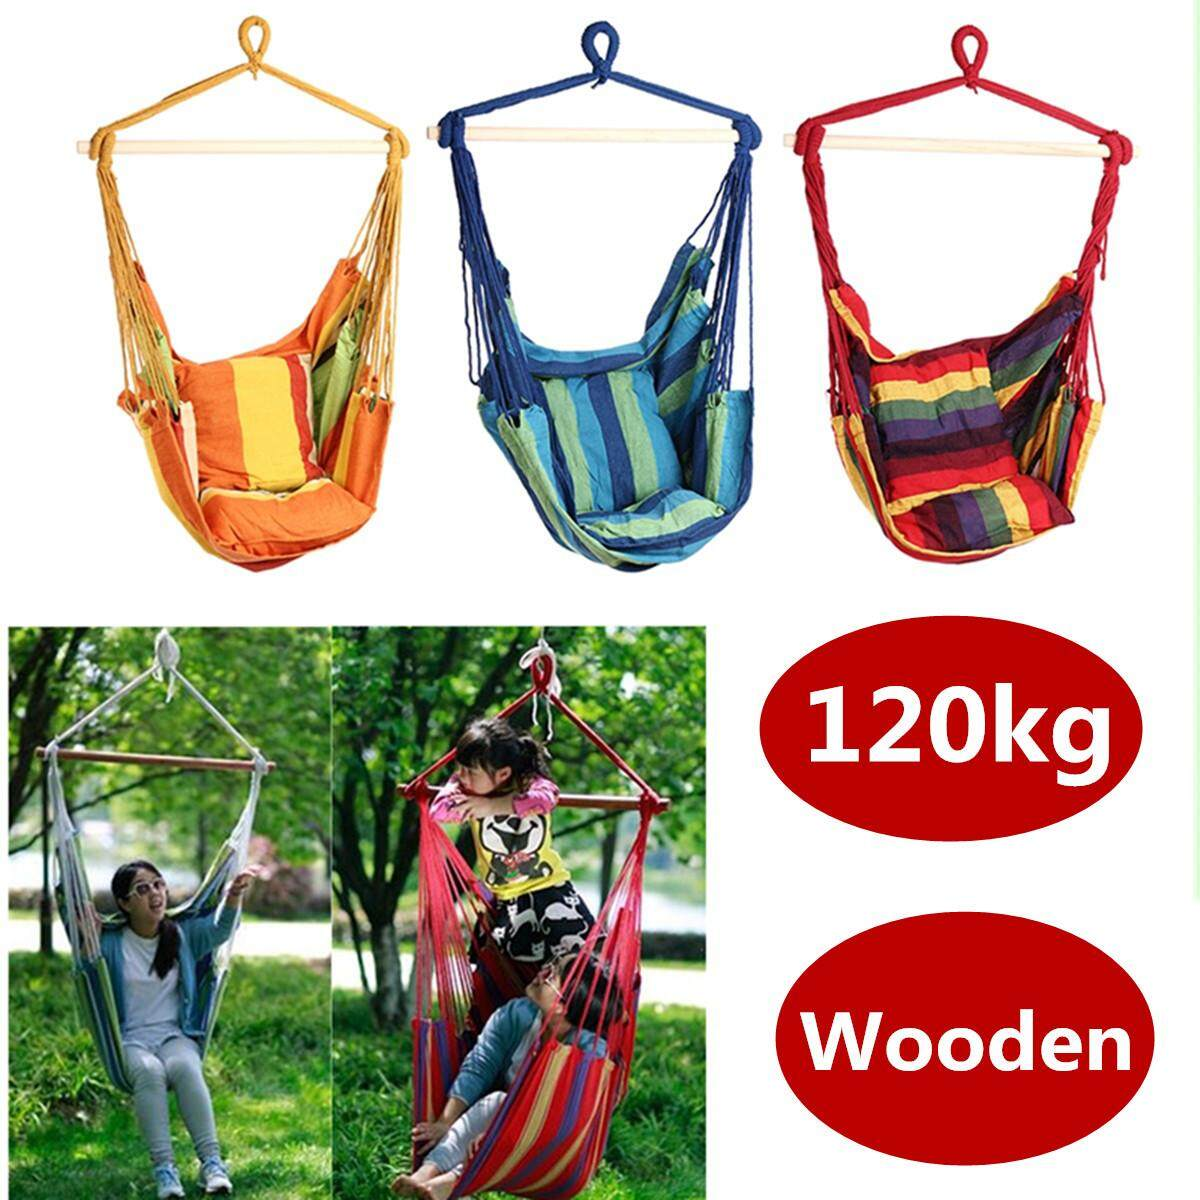 Deluxe Hammock Chair Hammocks Hanging Chair Swing Indoor Outdoor Camping 130*100*80cm By Moonbeam.